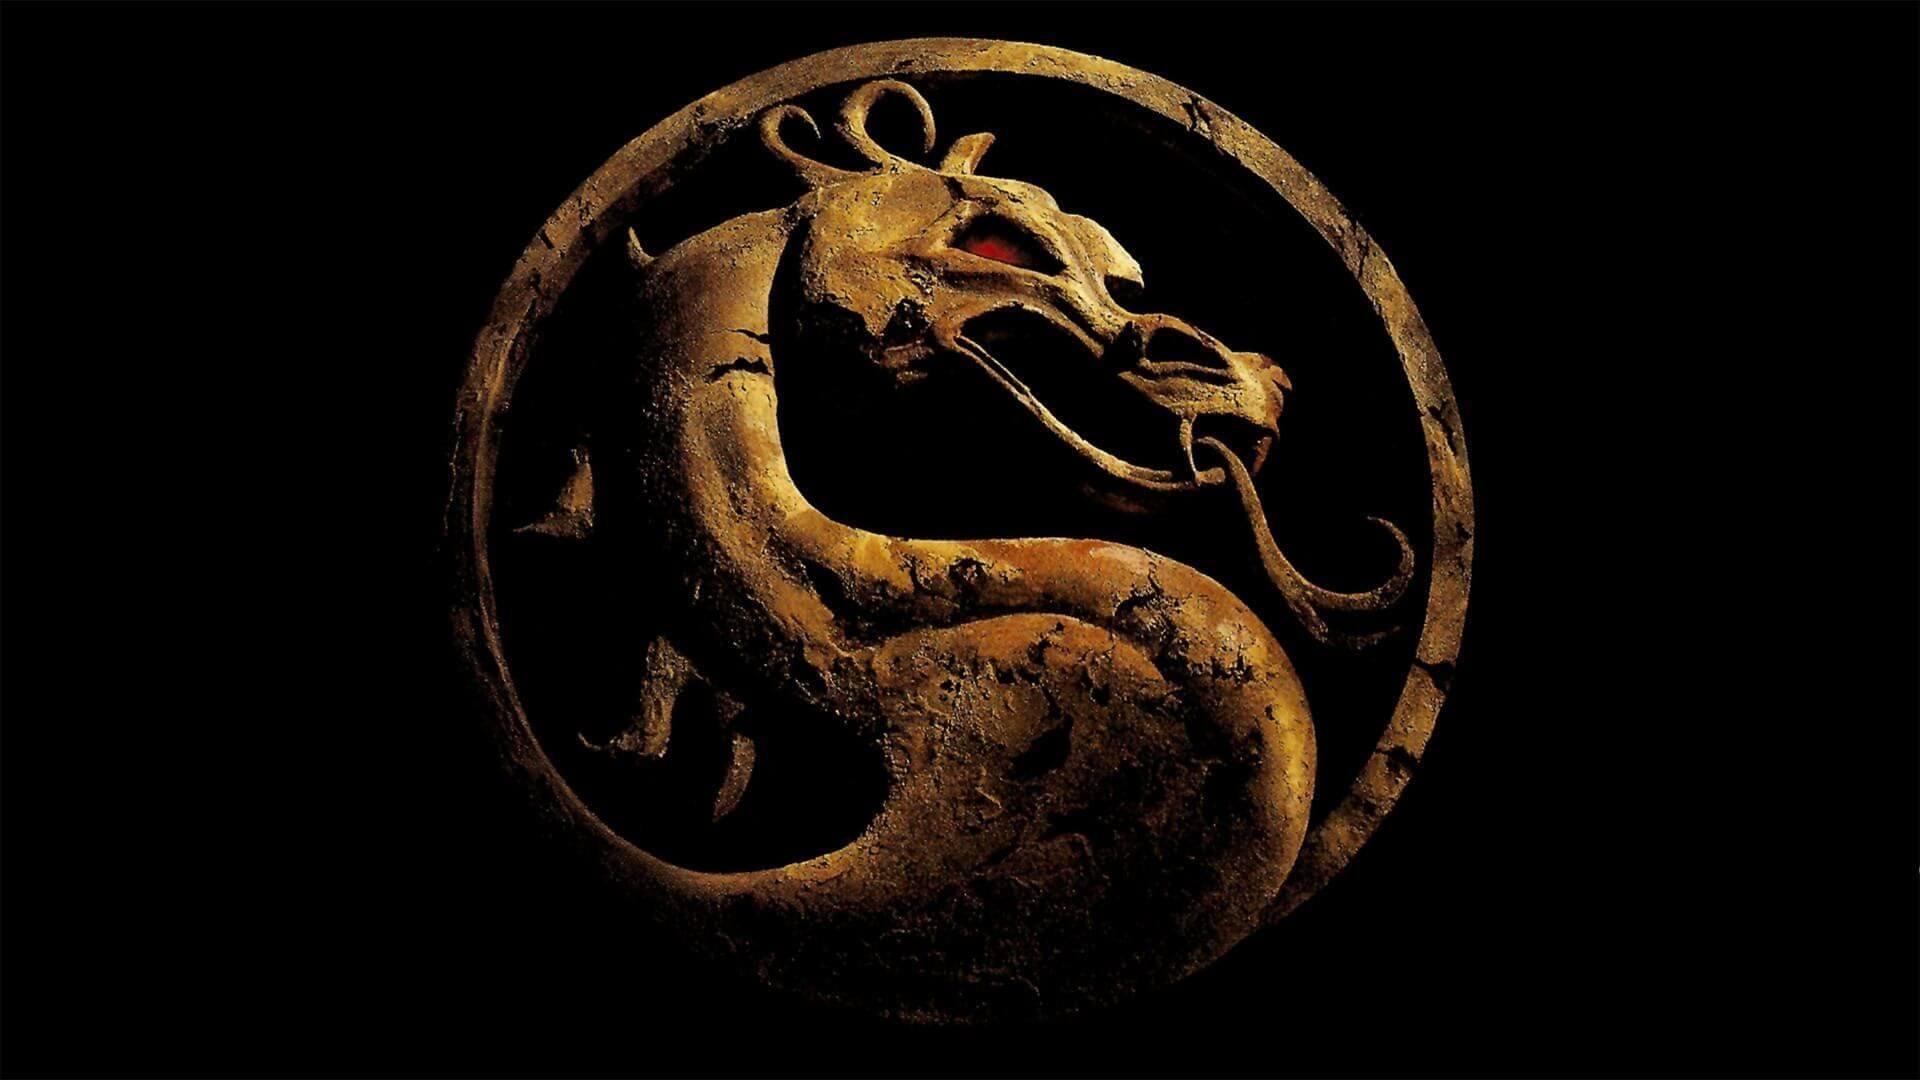 Mortal Kombat movie trailer finally released